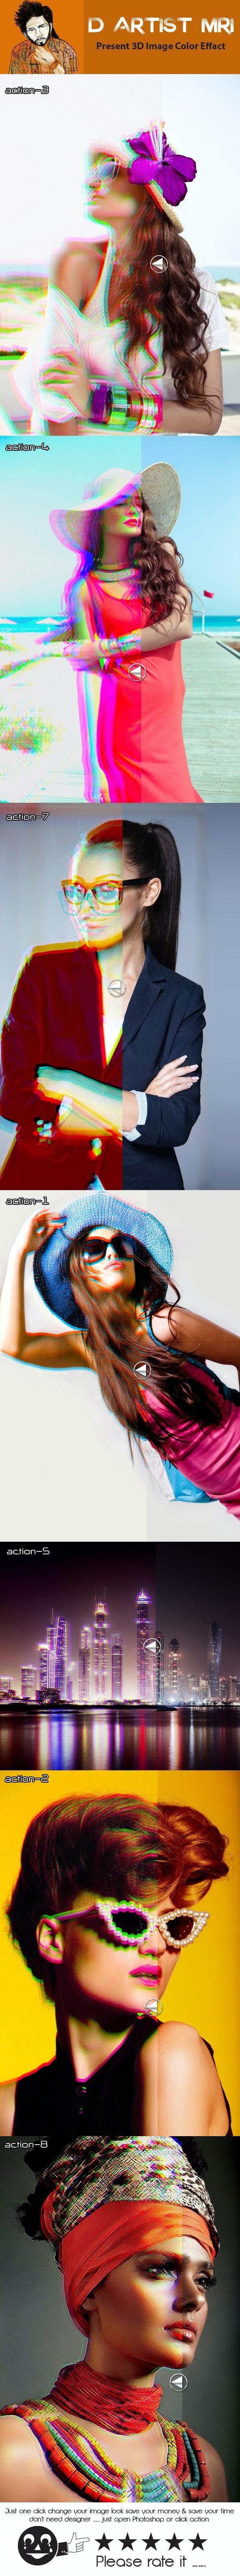 3D Image Color Effact - Actions Photoshop